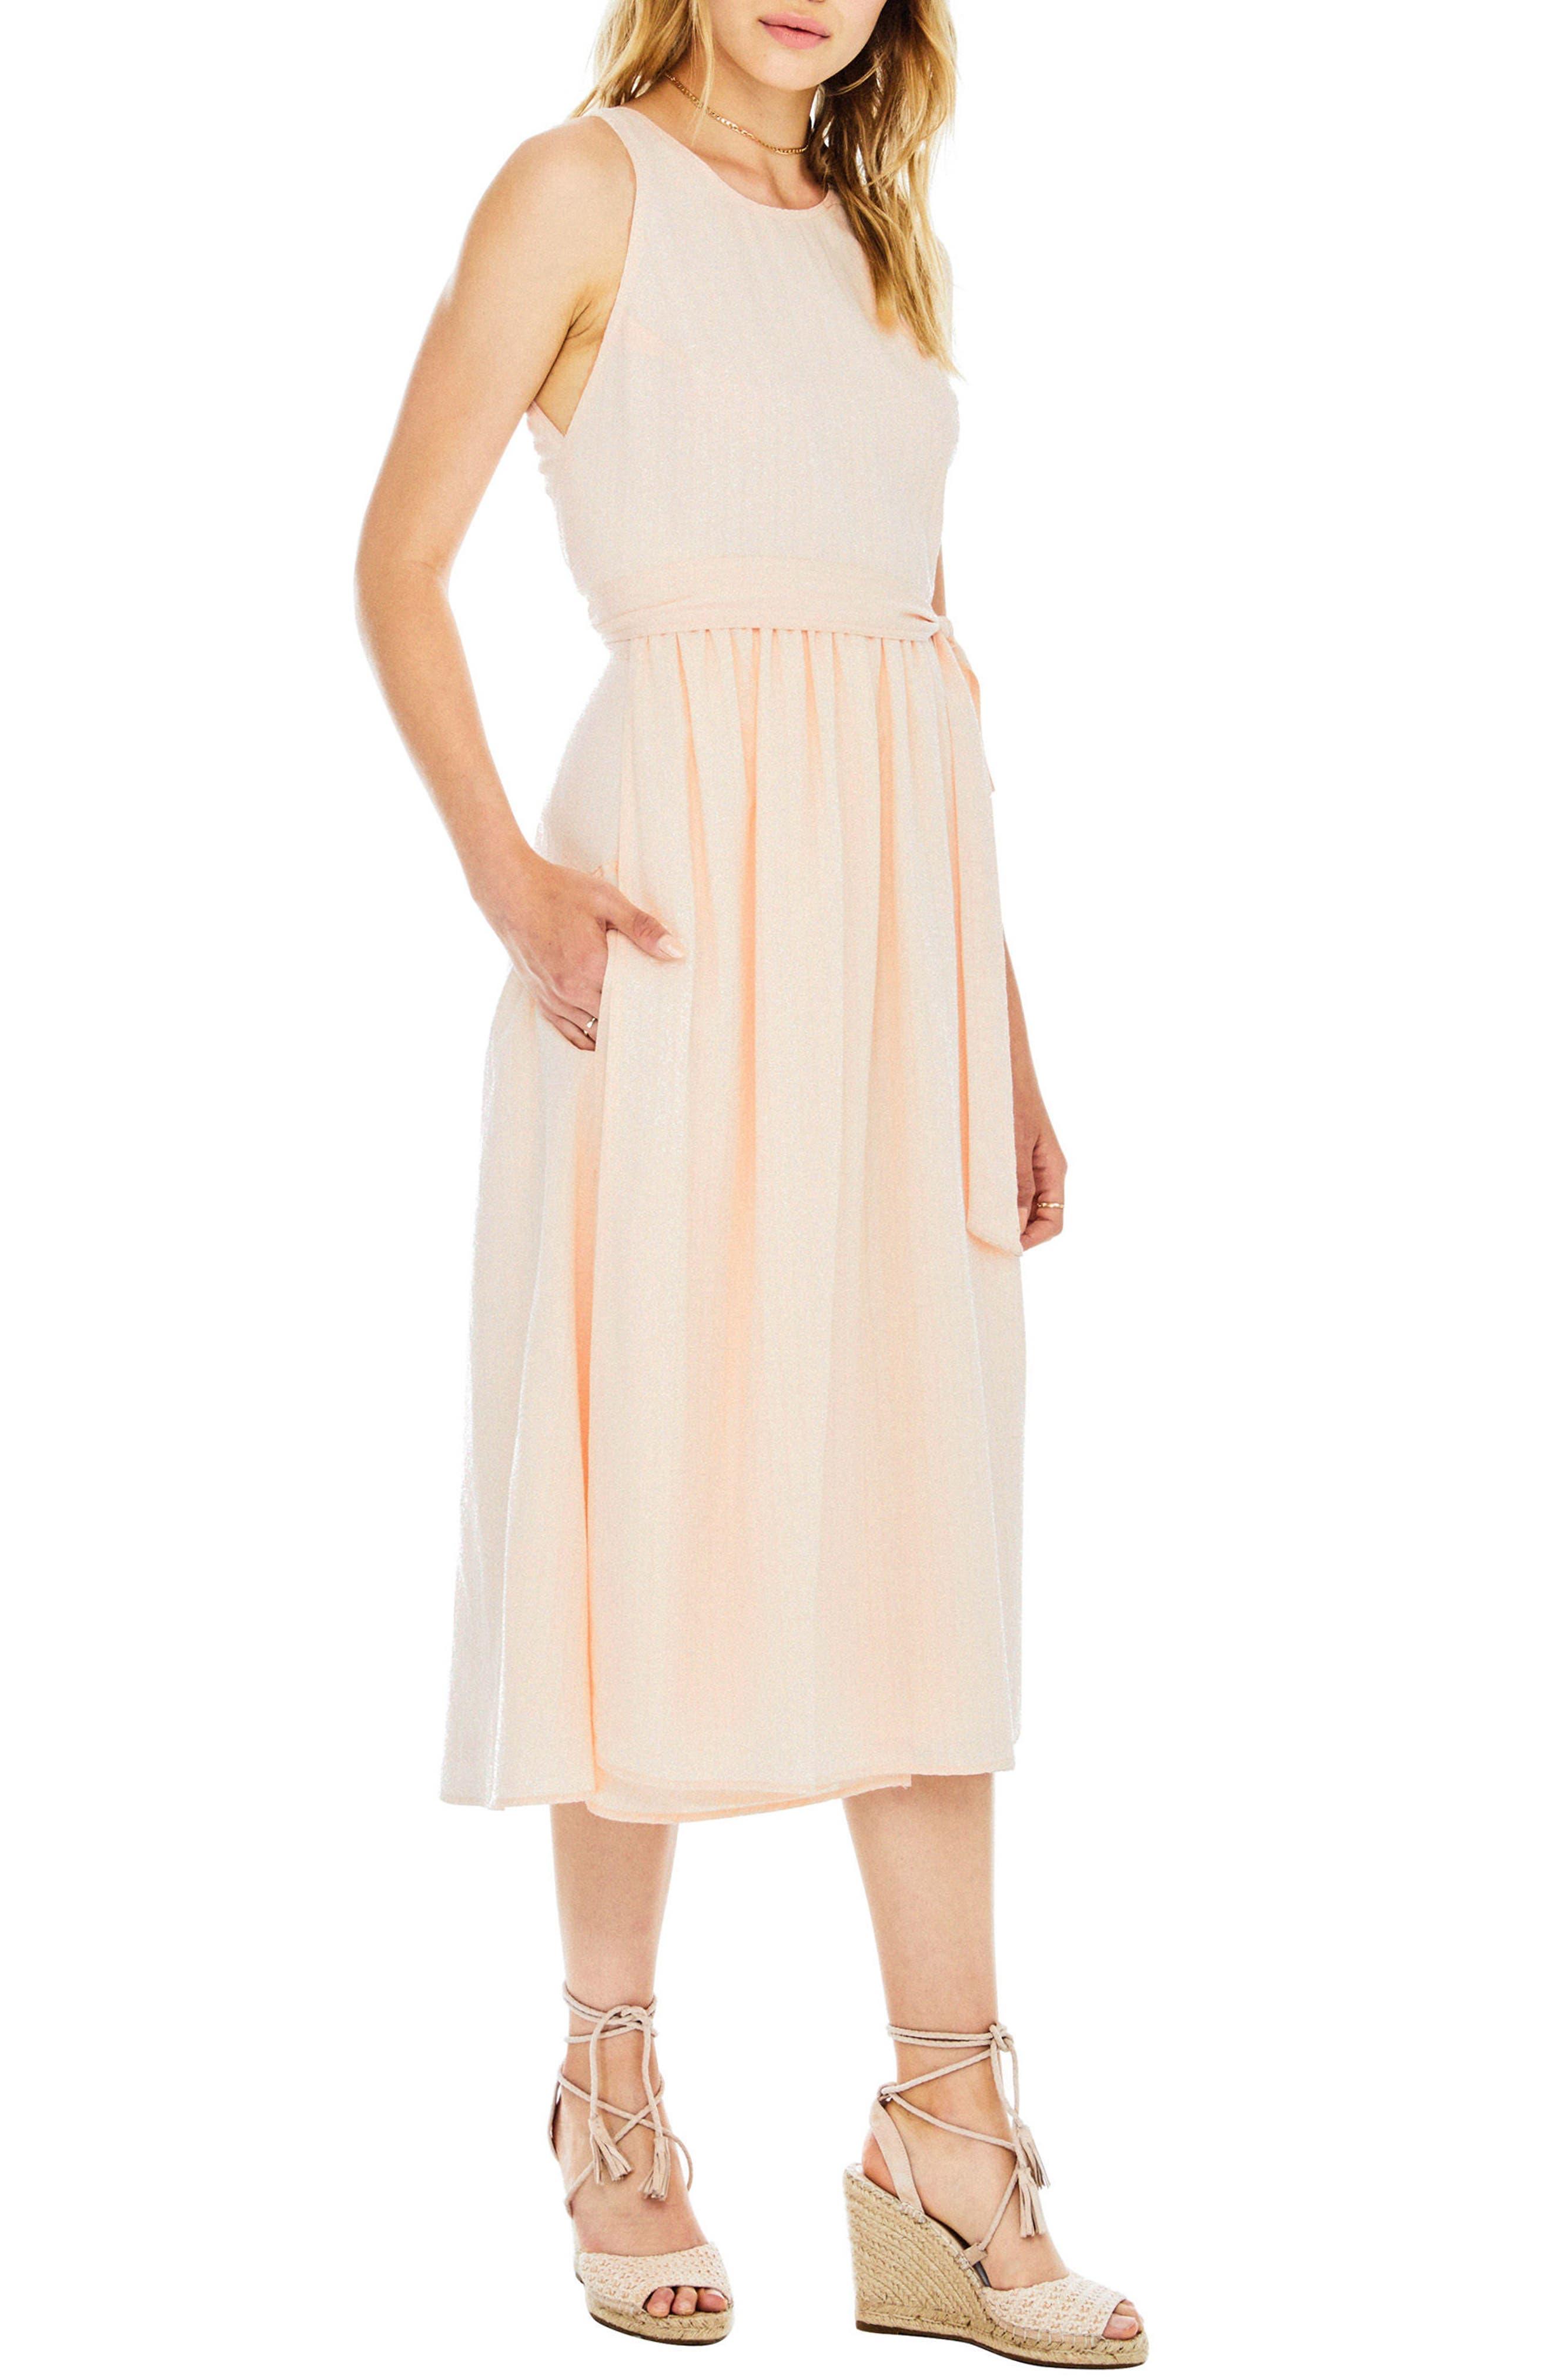 Brady Dress,                             Alternate thumbnail 3, color,                             668